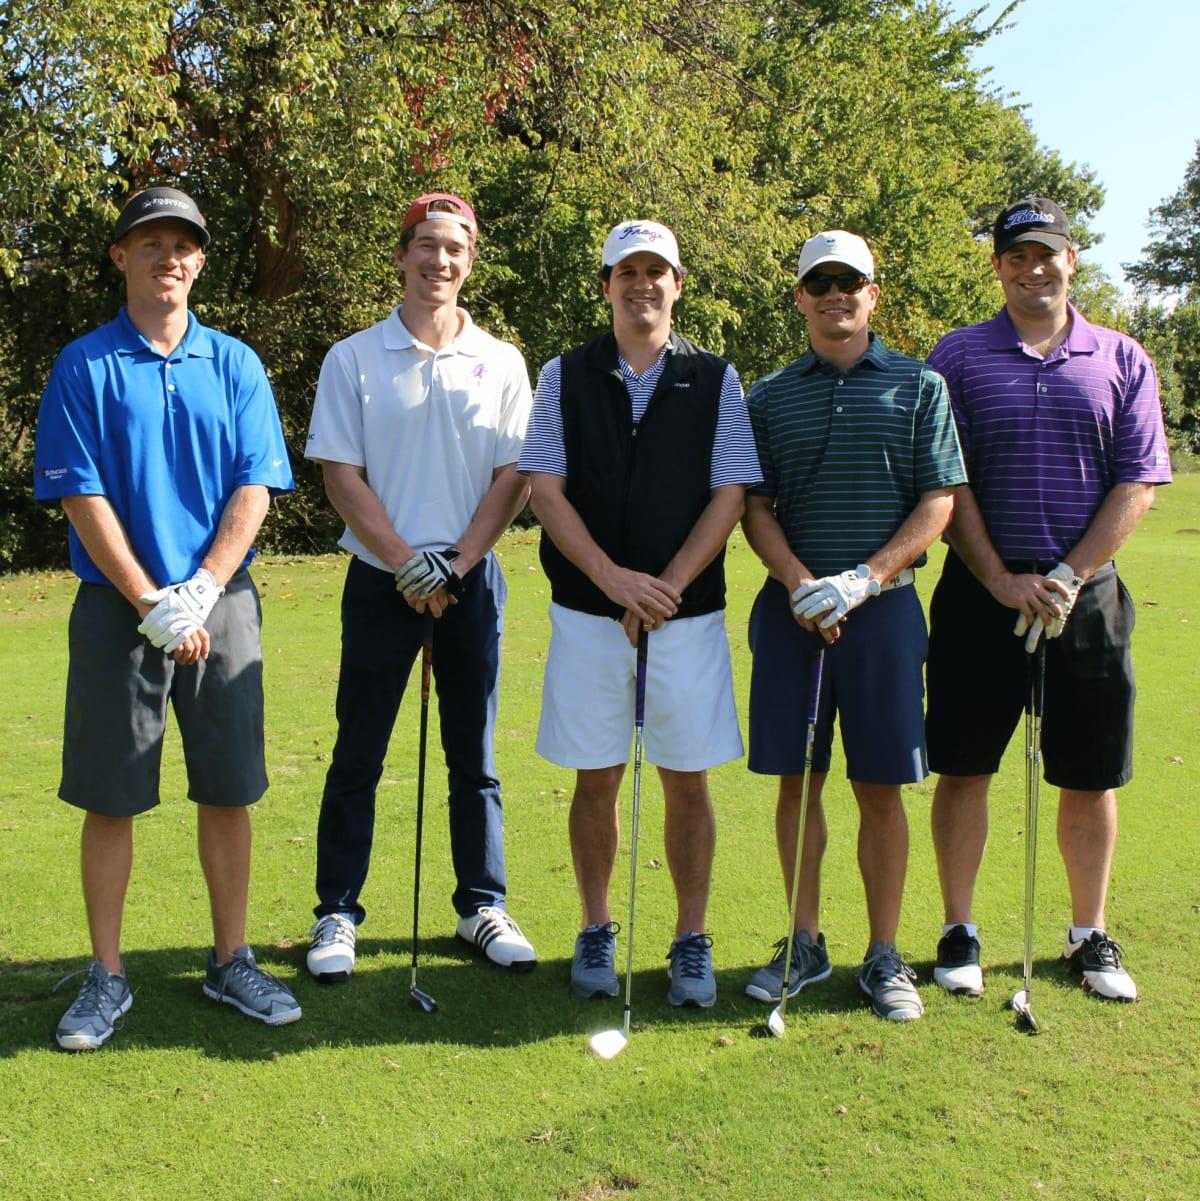 Ryan Godfrey, Jarrod Cox, JB Askew, David Muckelroy, Trevor Golden